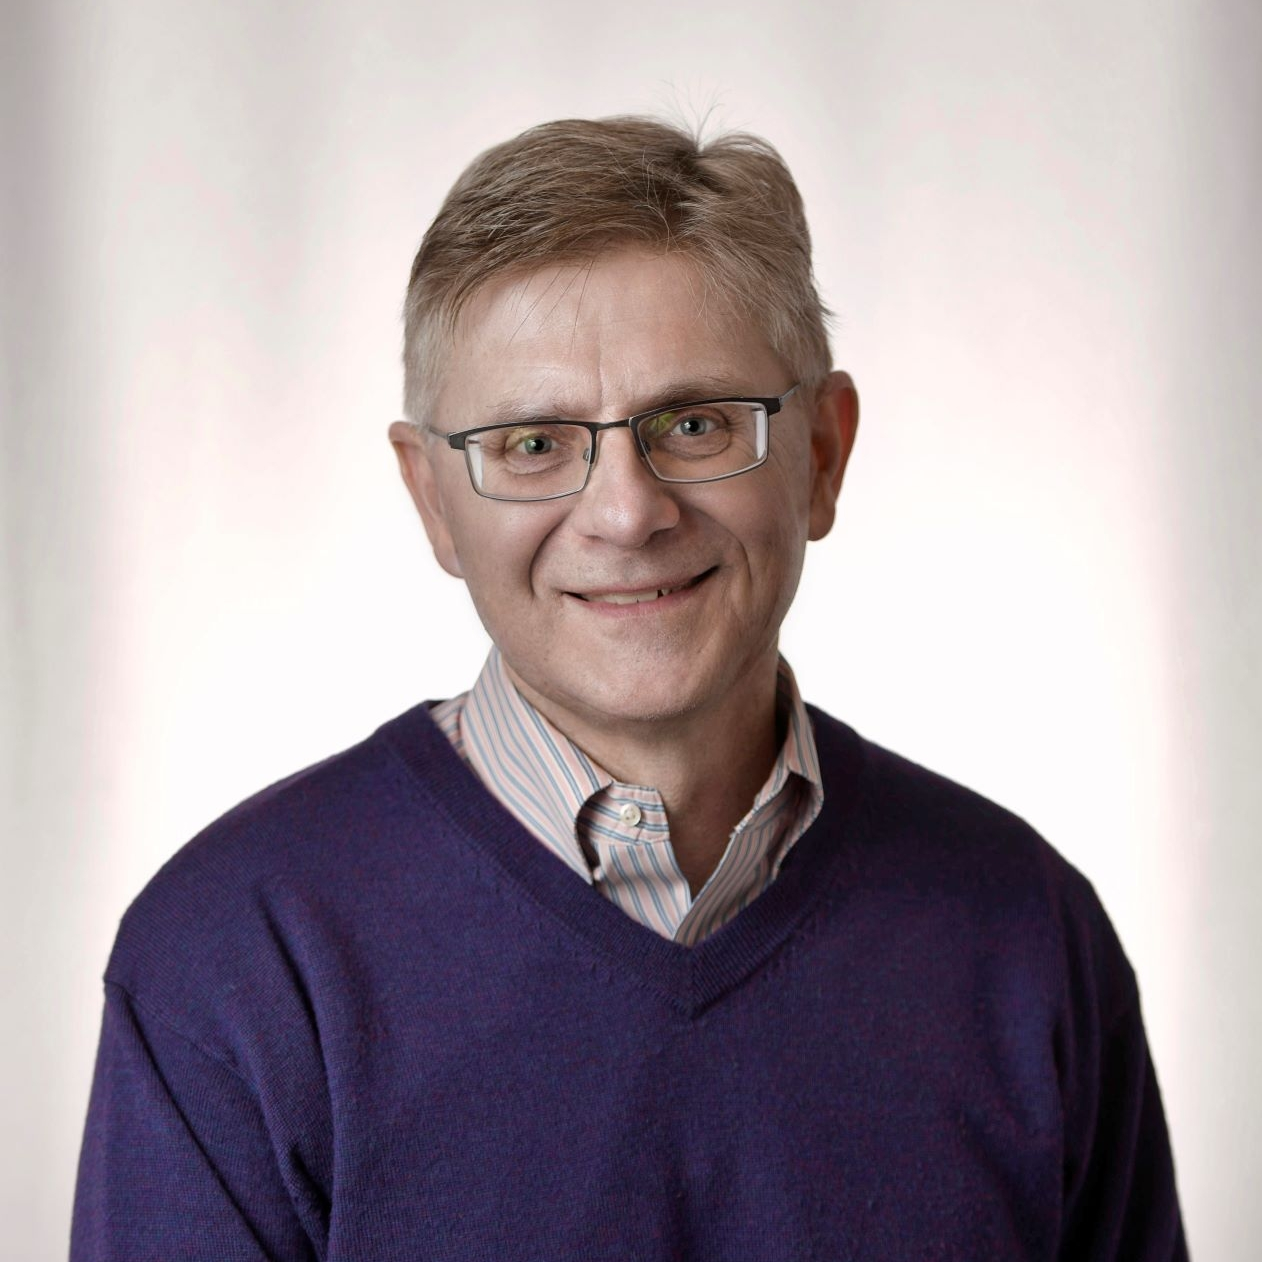 Bruce Bowler